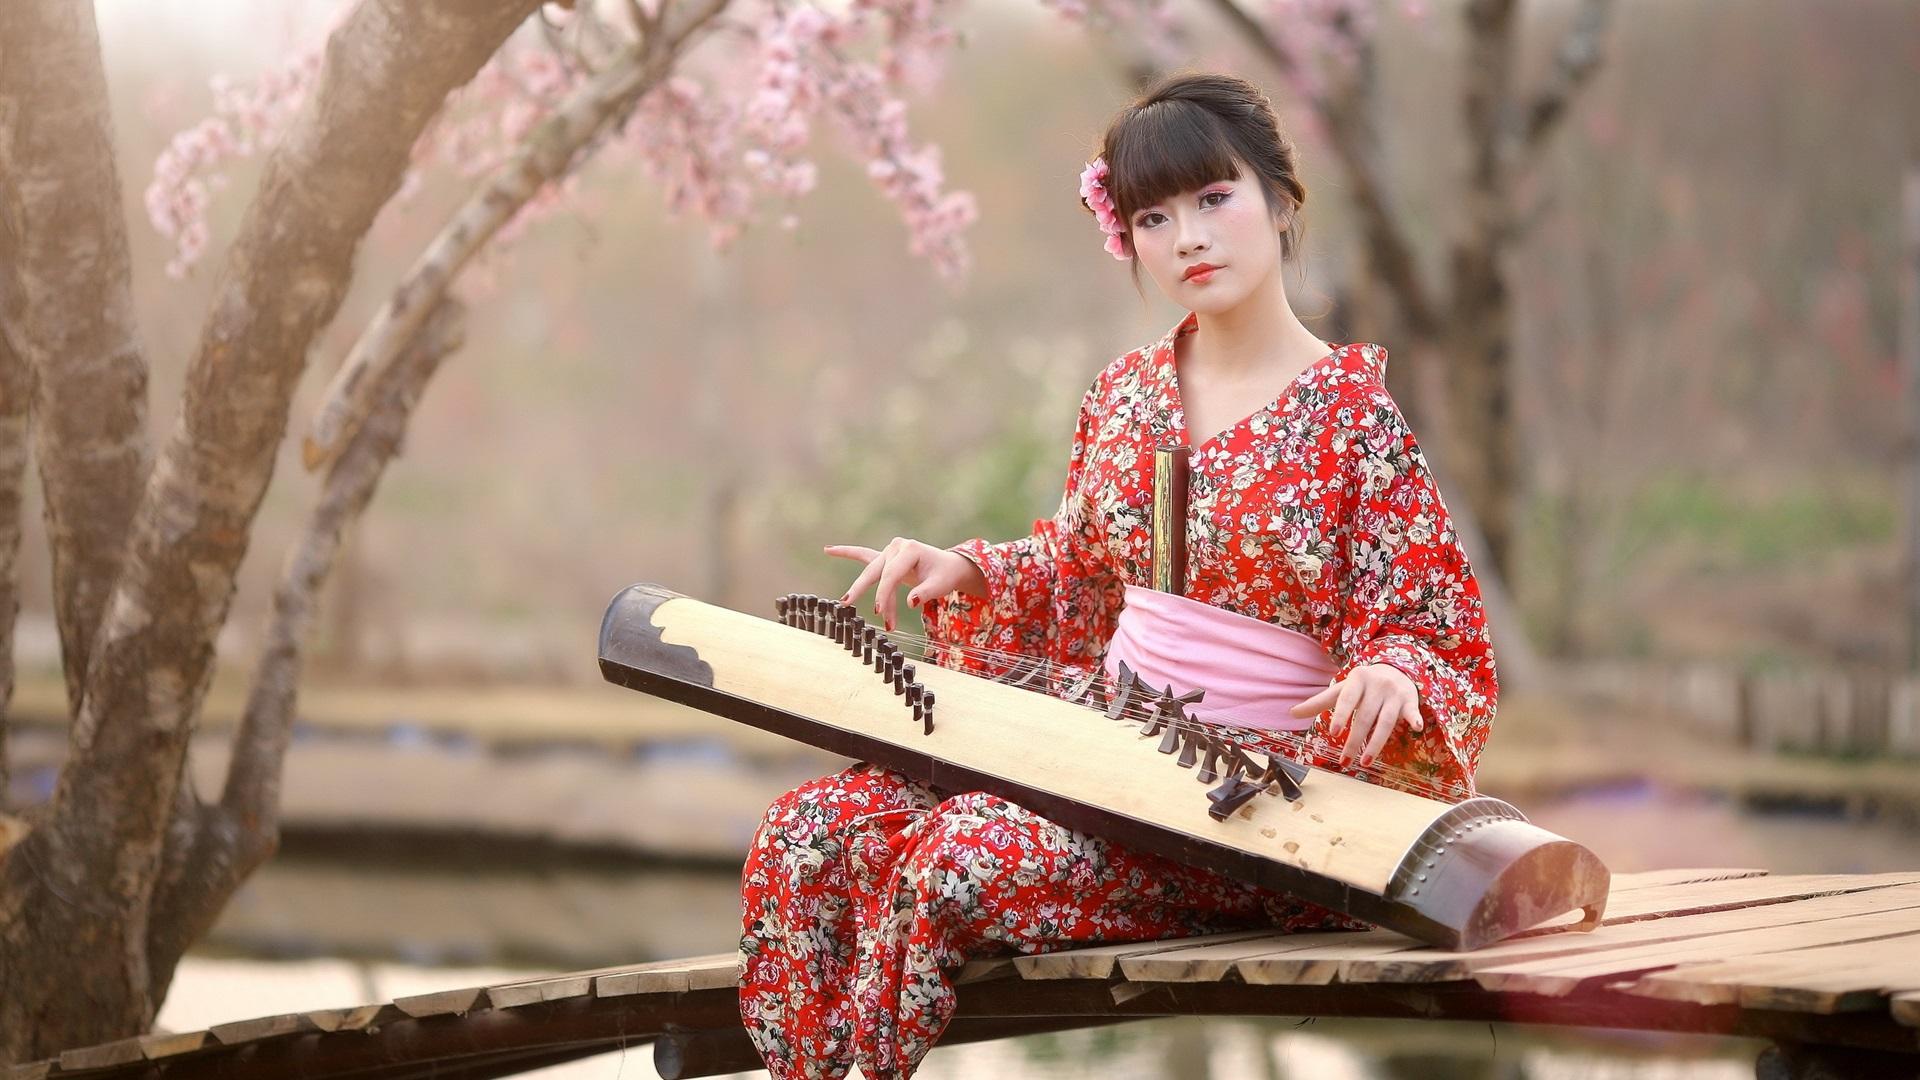 Japanese Kimono Wallpaper - WallpaperSafari